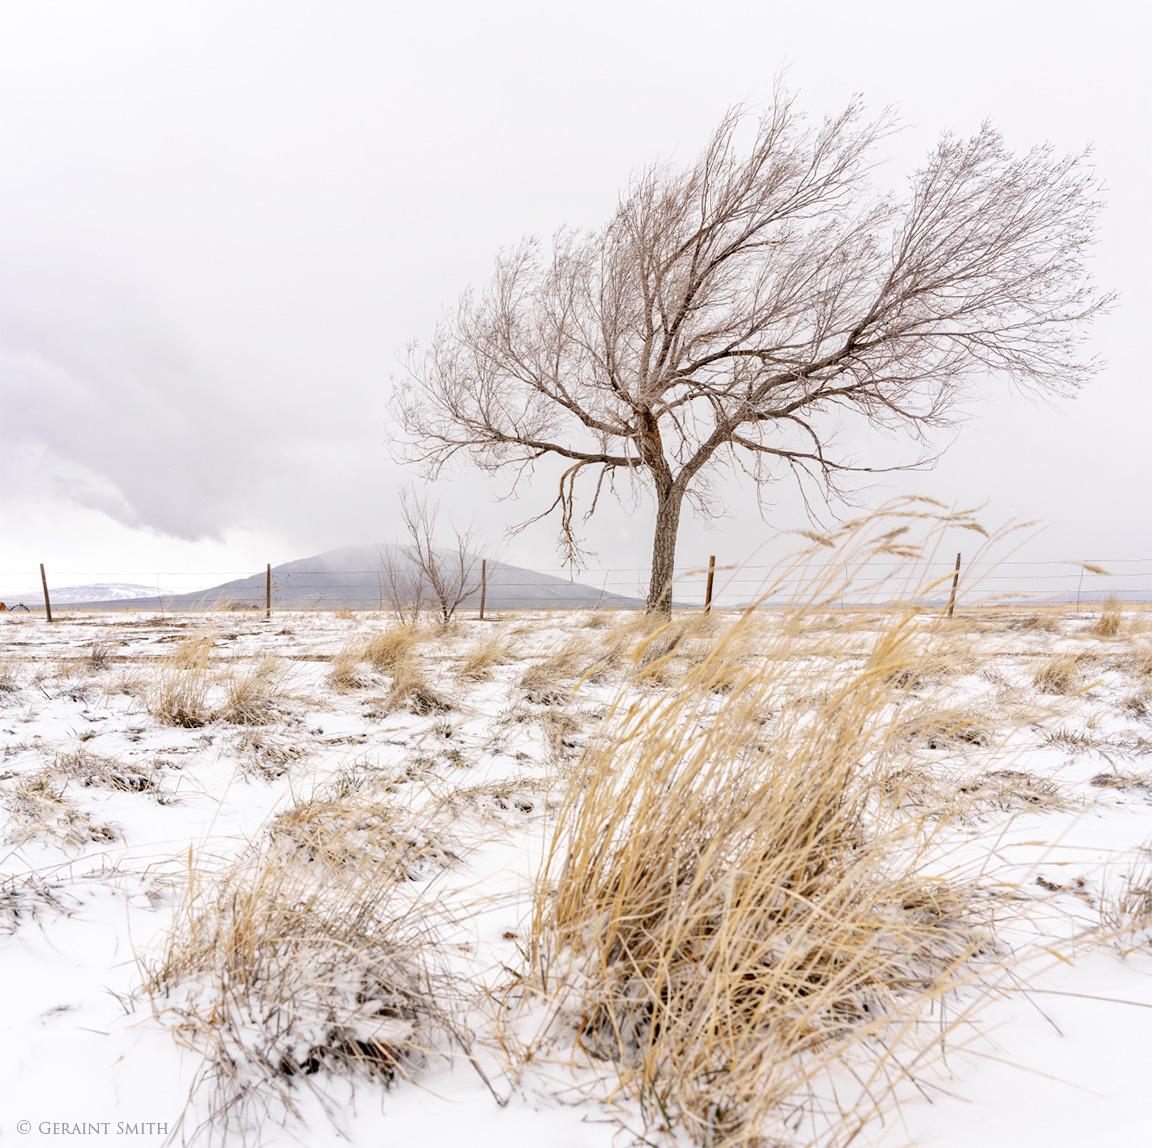 Ute Mountain Tree